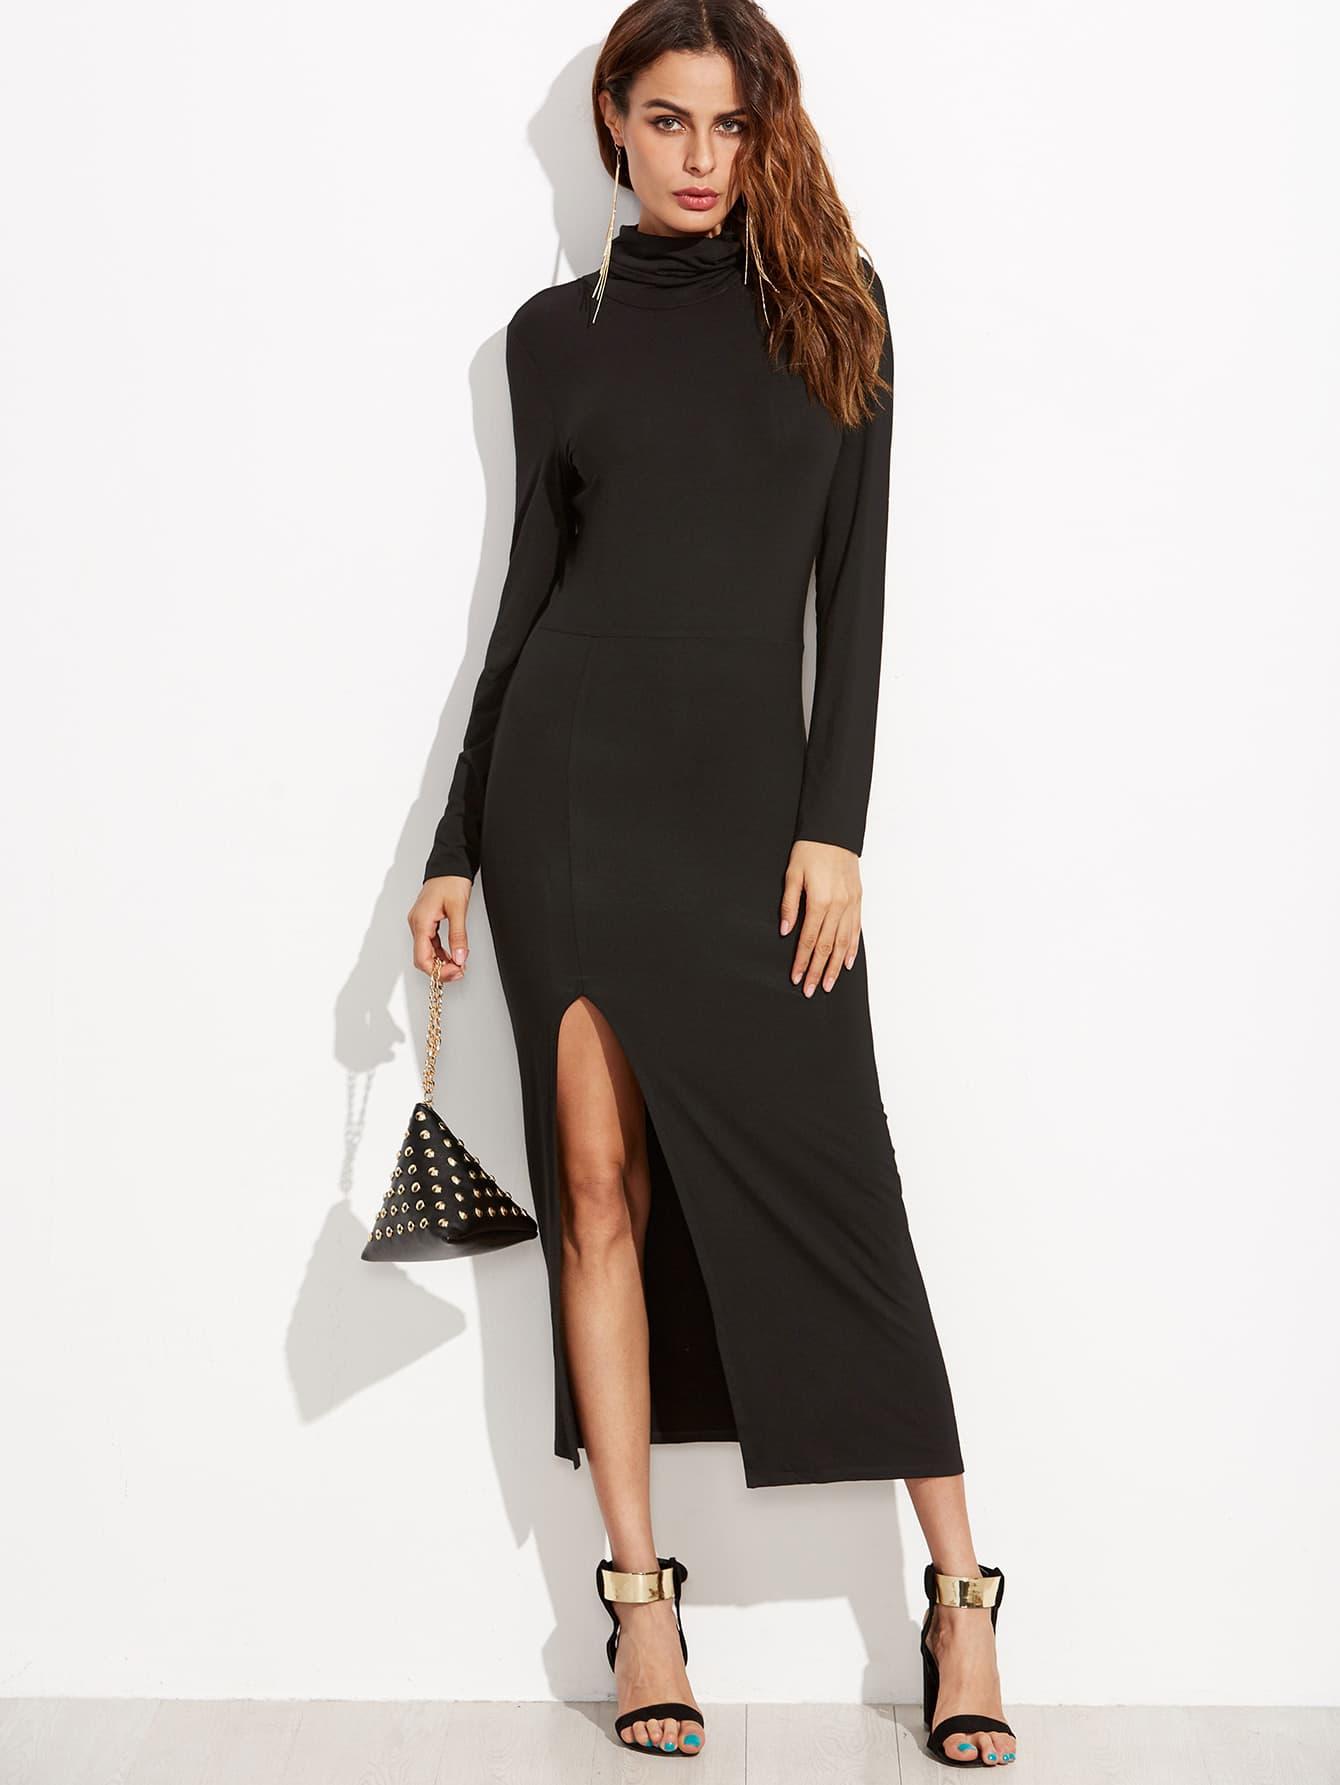 Black Cowl Neck High Slit Sheath Dress dress160909510